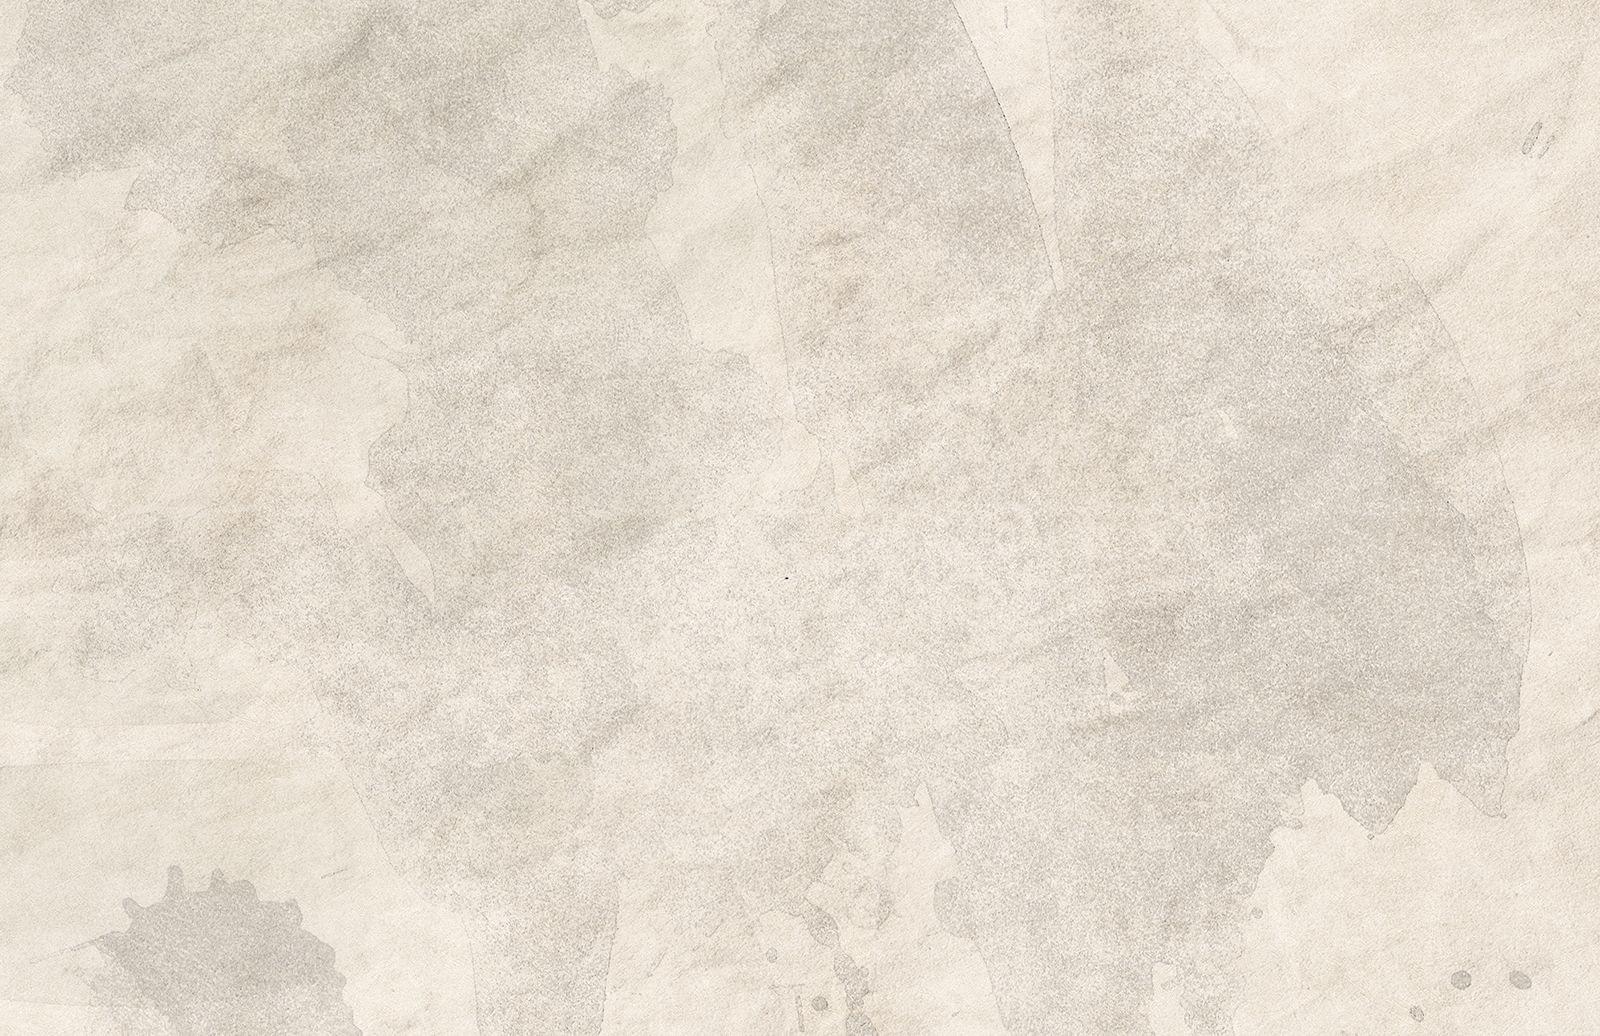 Grey Polished Concrete Floor